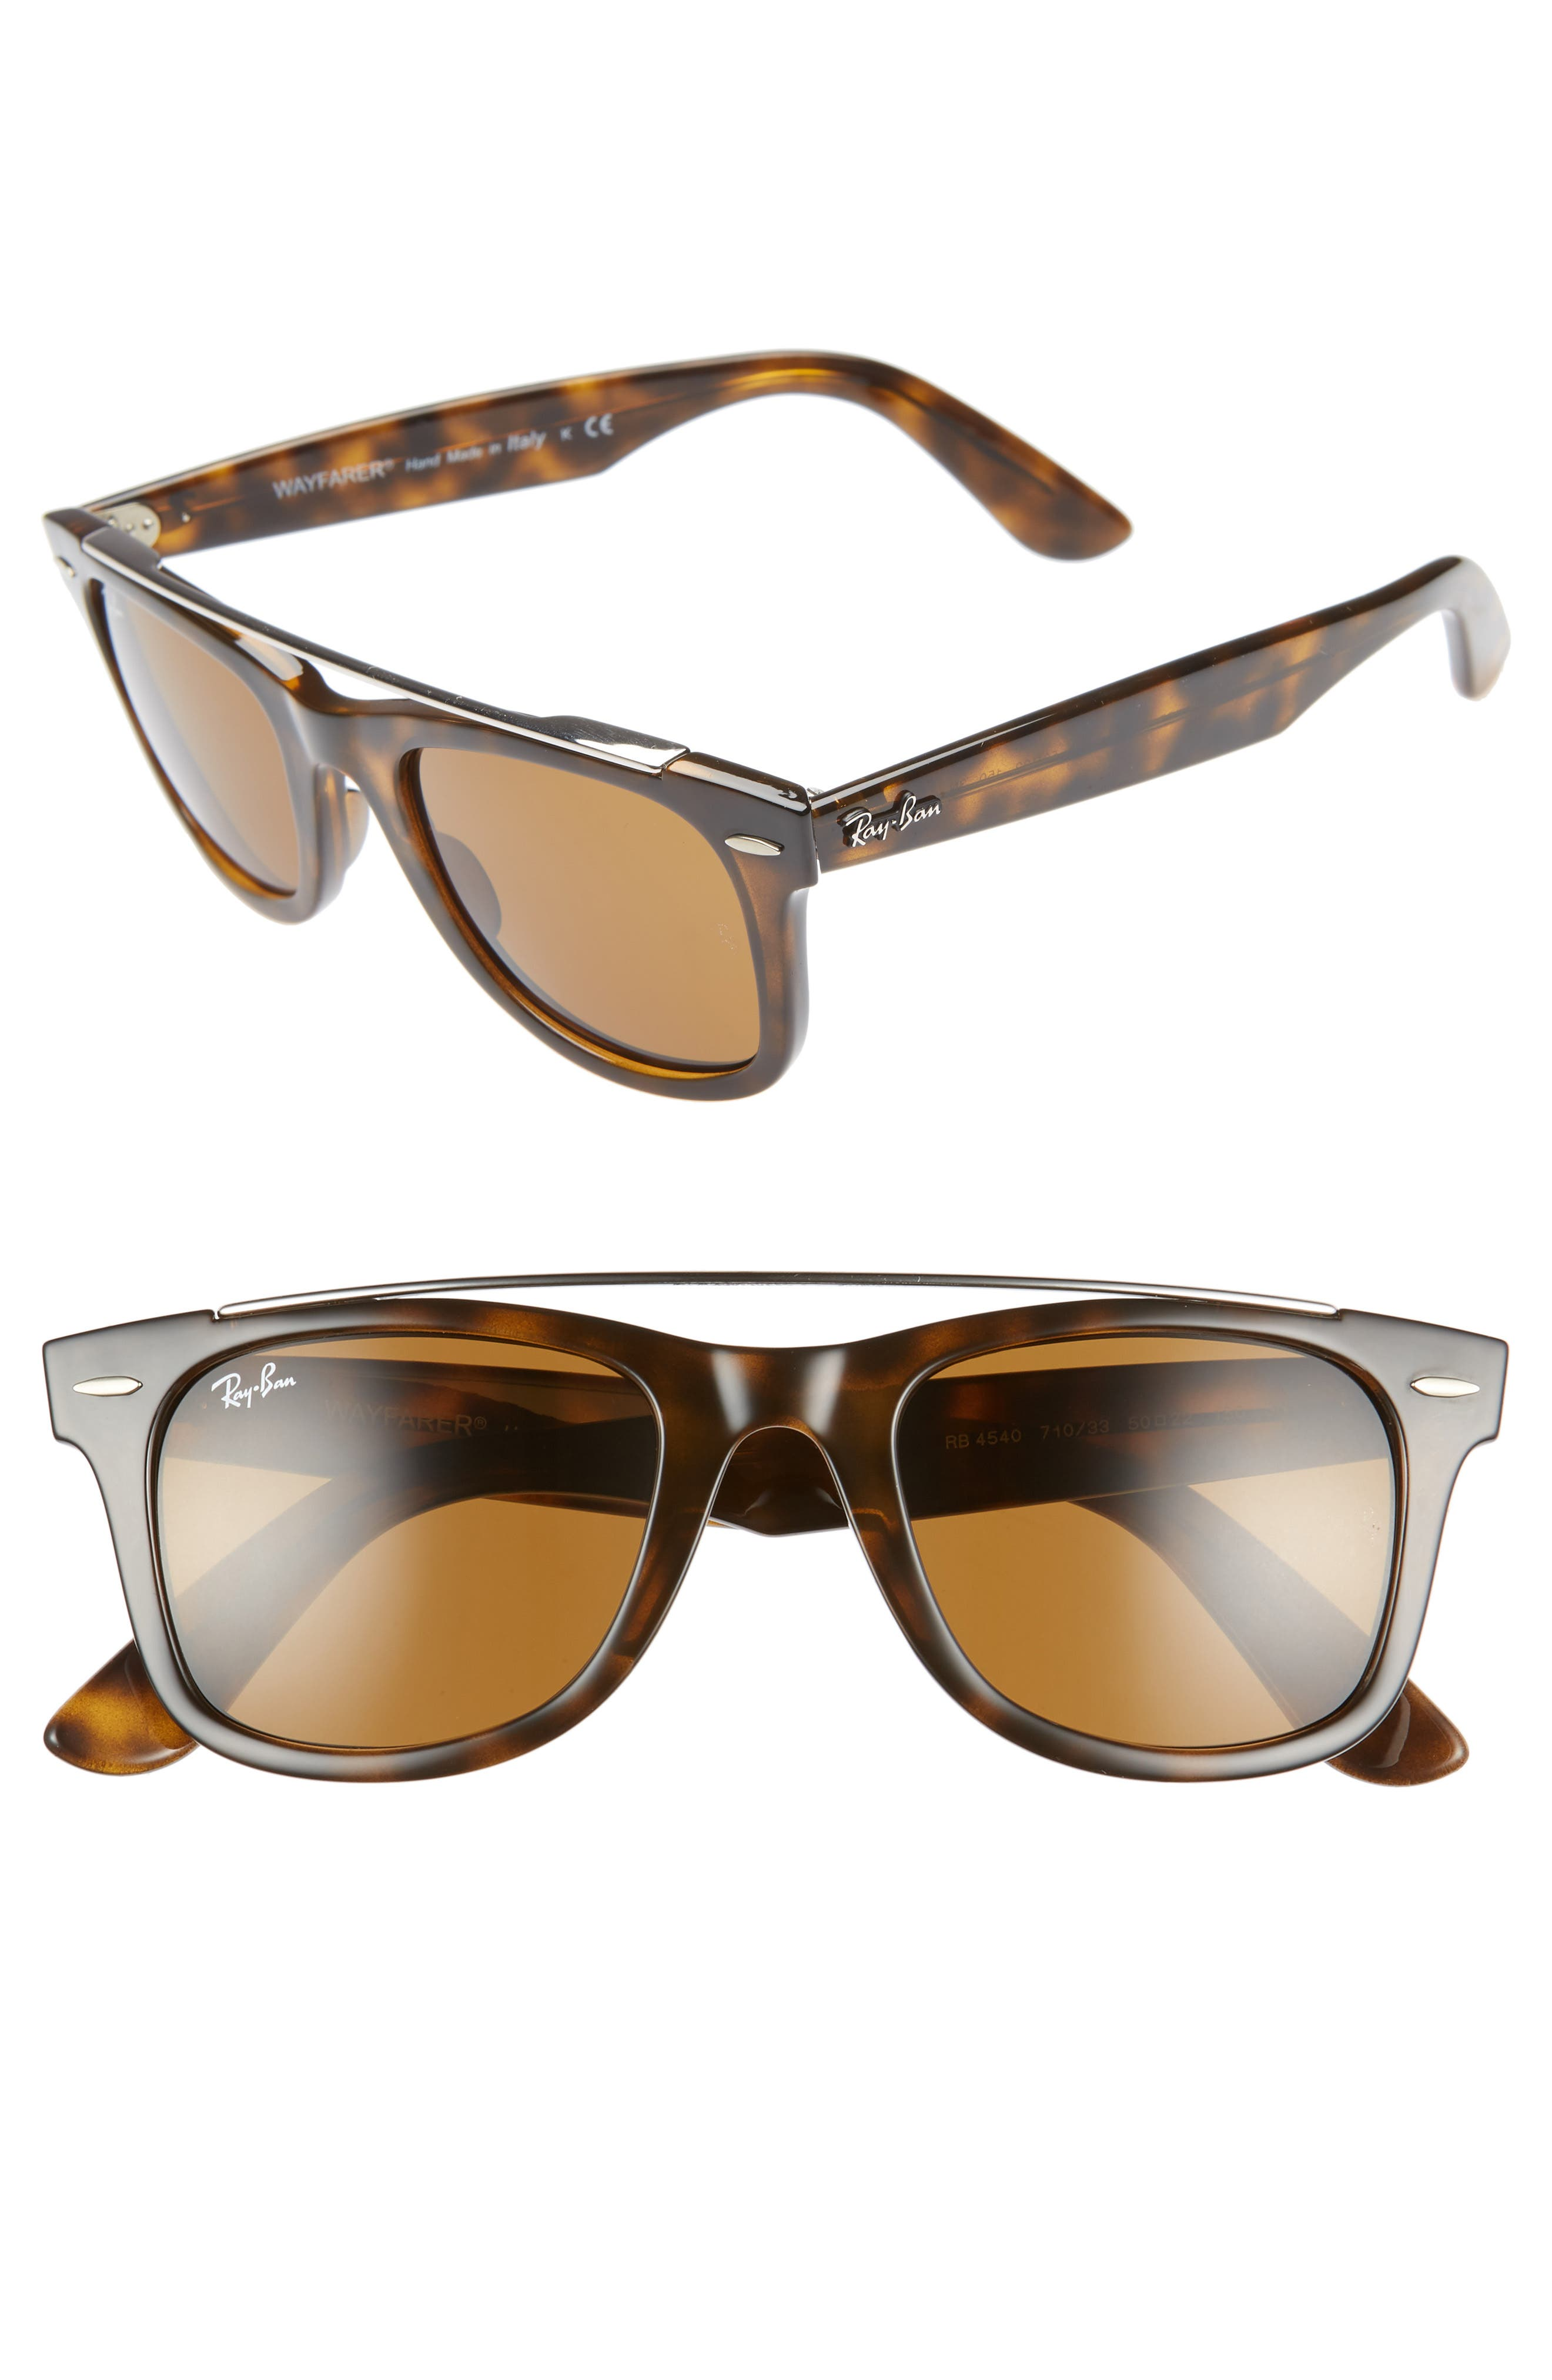 Ray-Ban 50Mm Wayfarer Sunglasses - Havana Solid